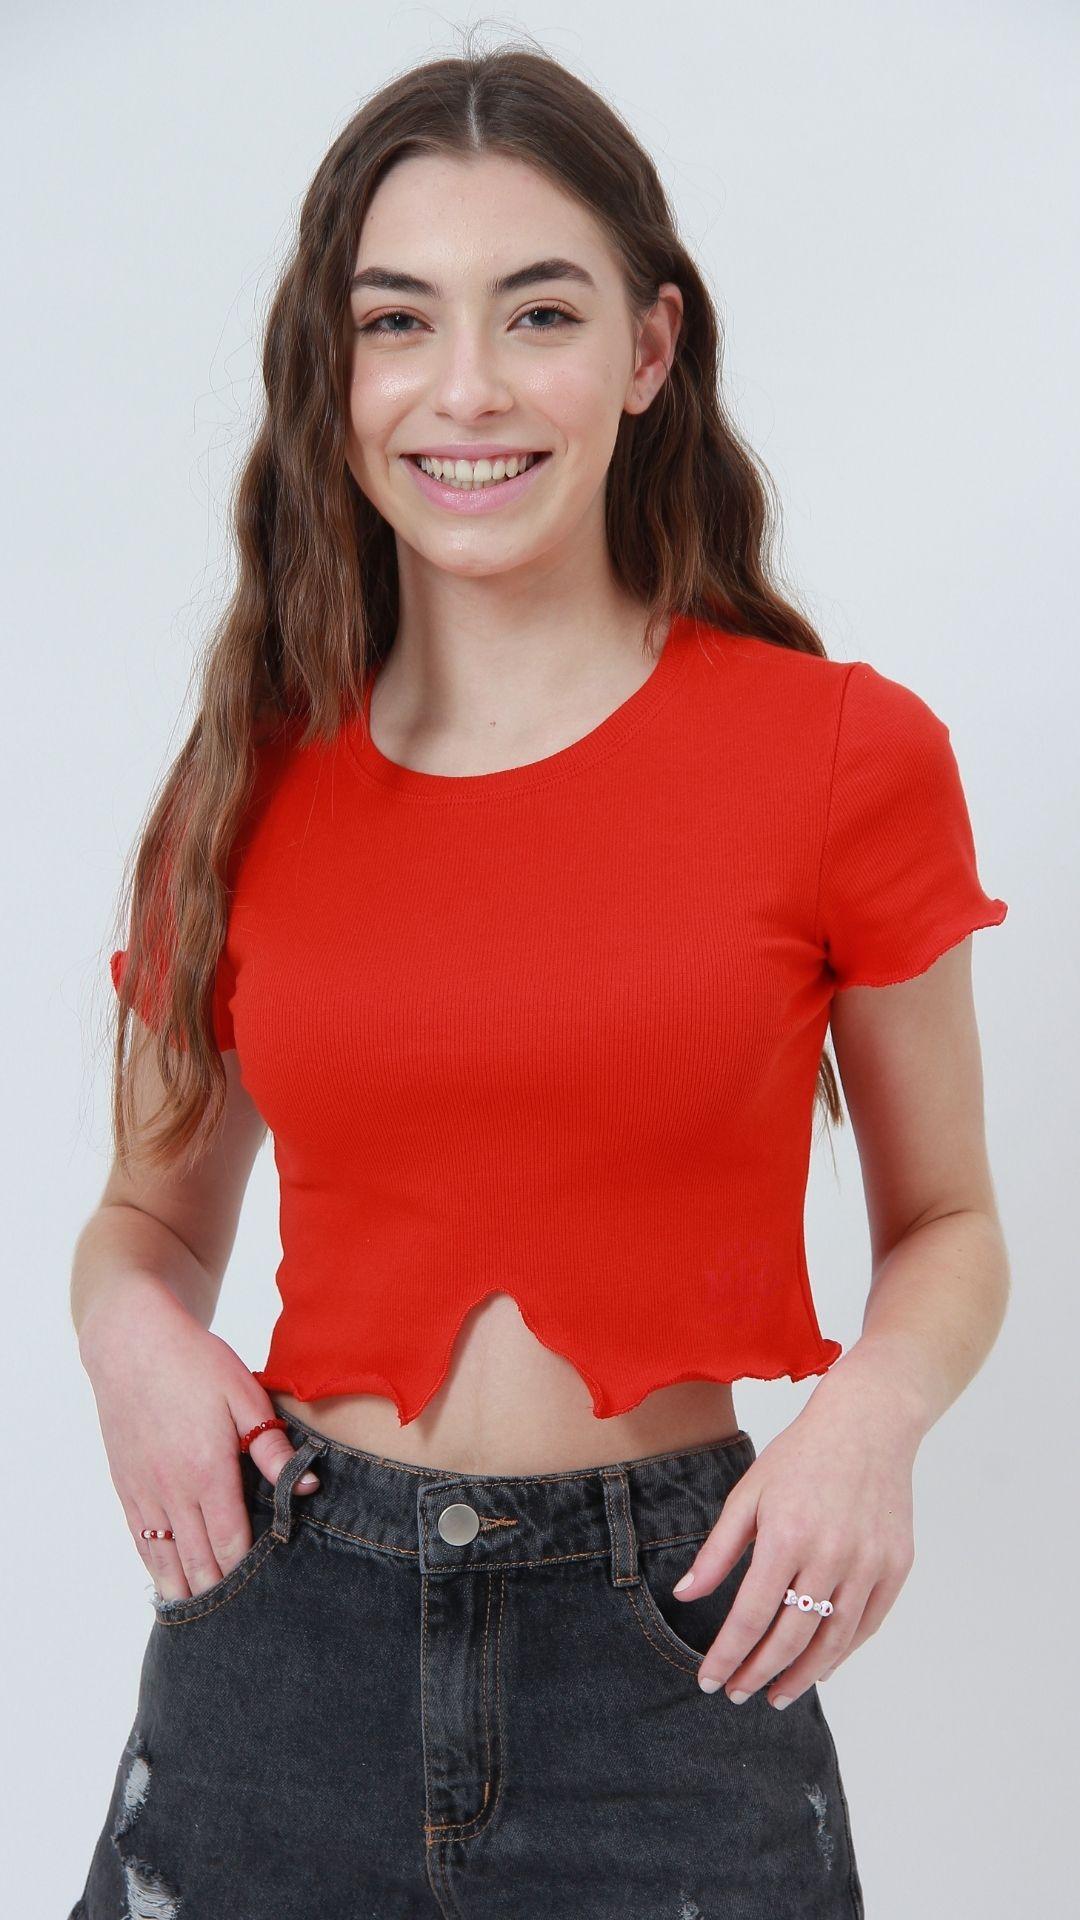 T-shirt Ribbed Frills Vermelho  - Metro & Co.